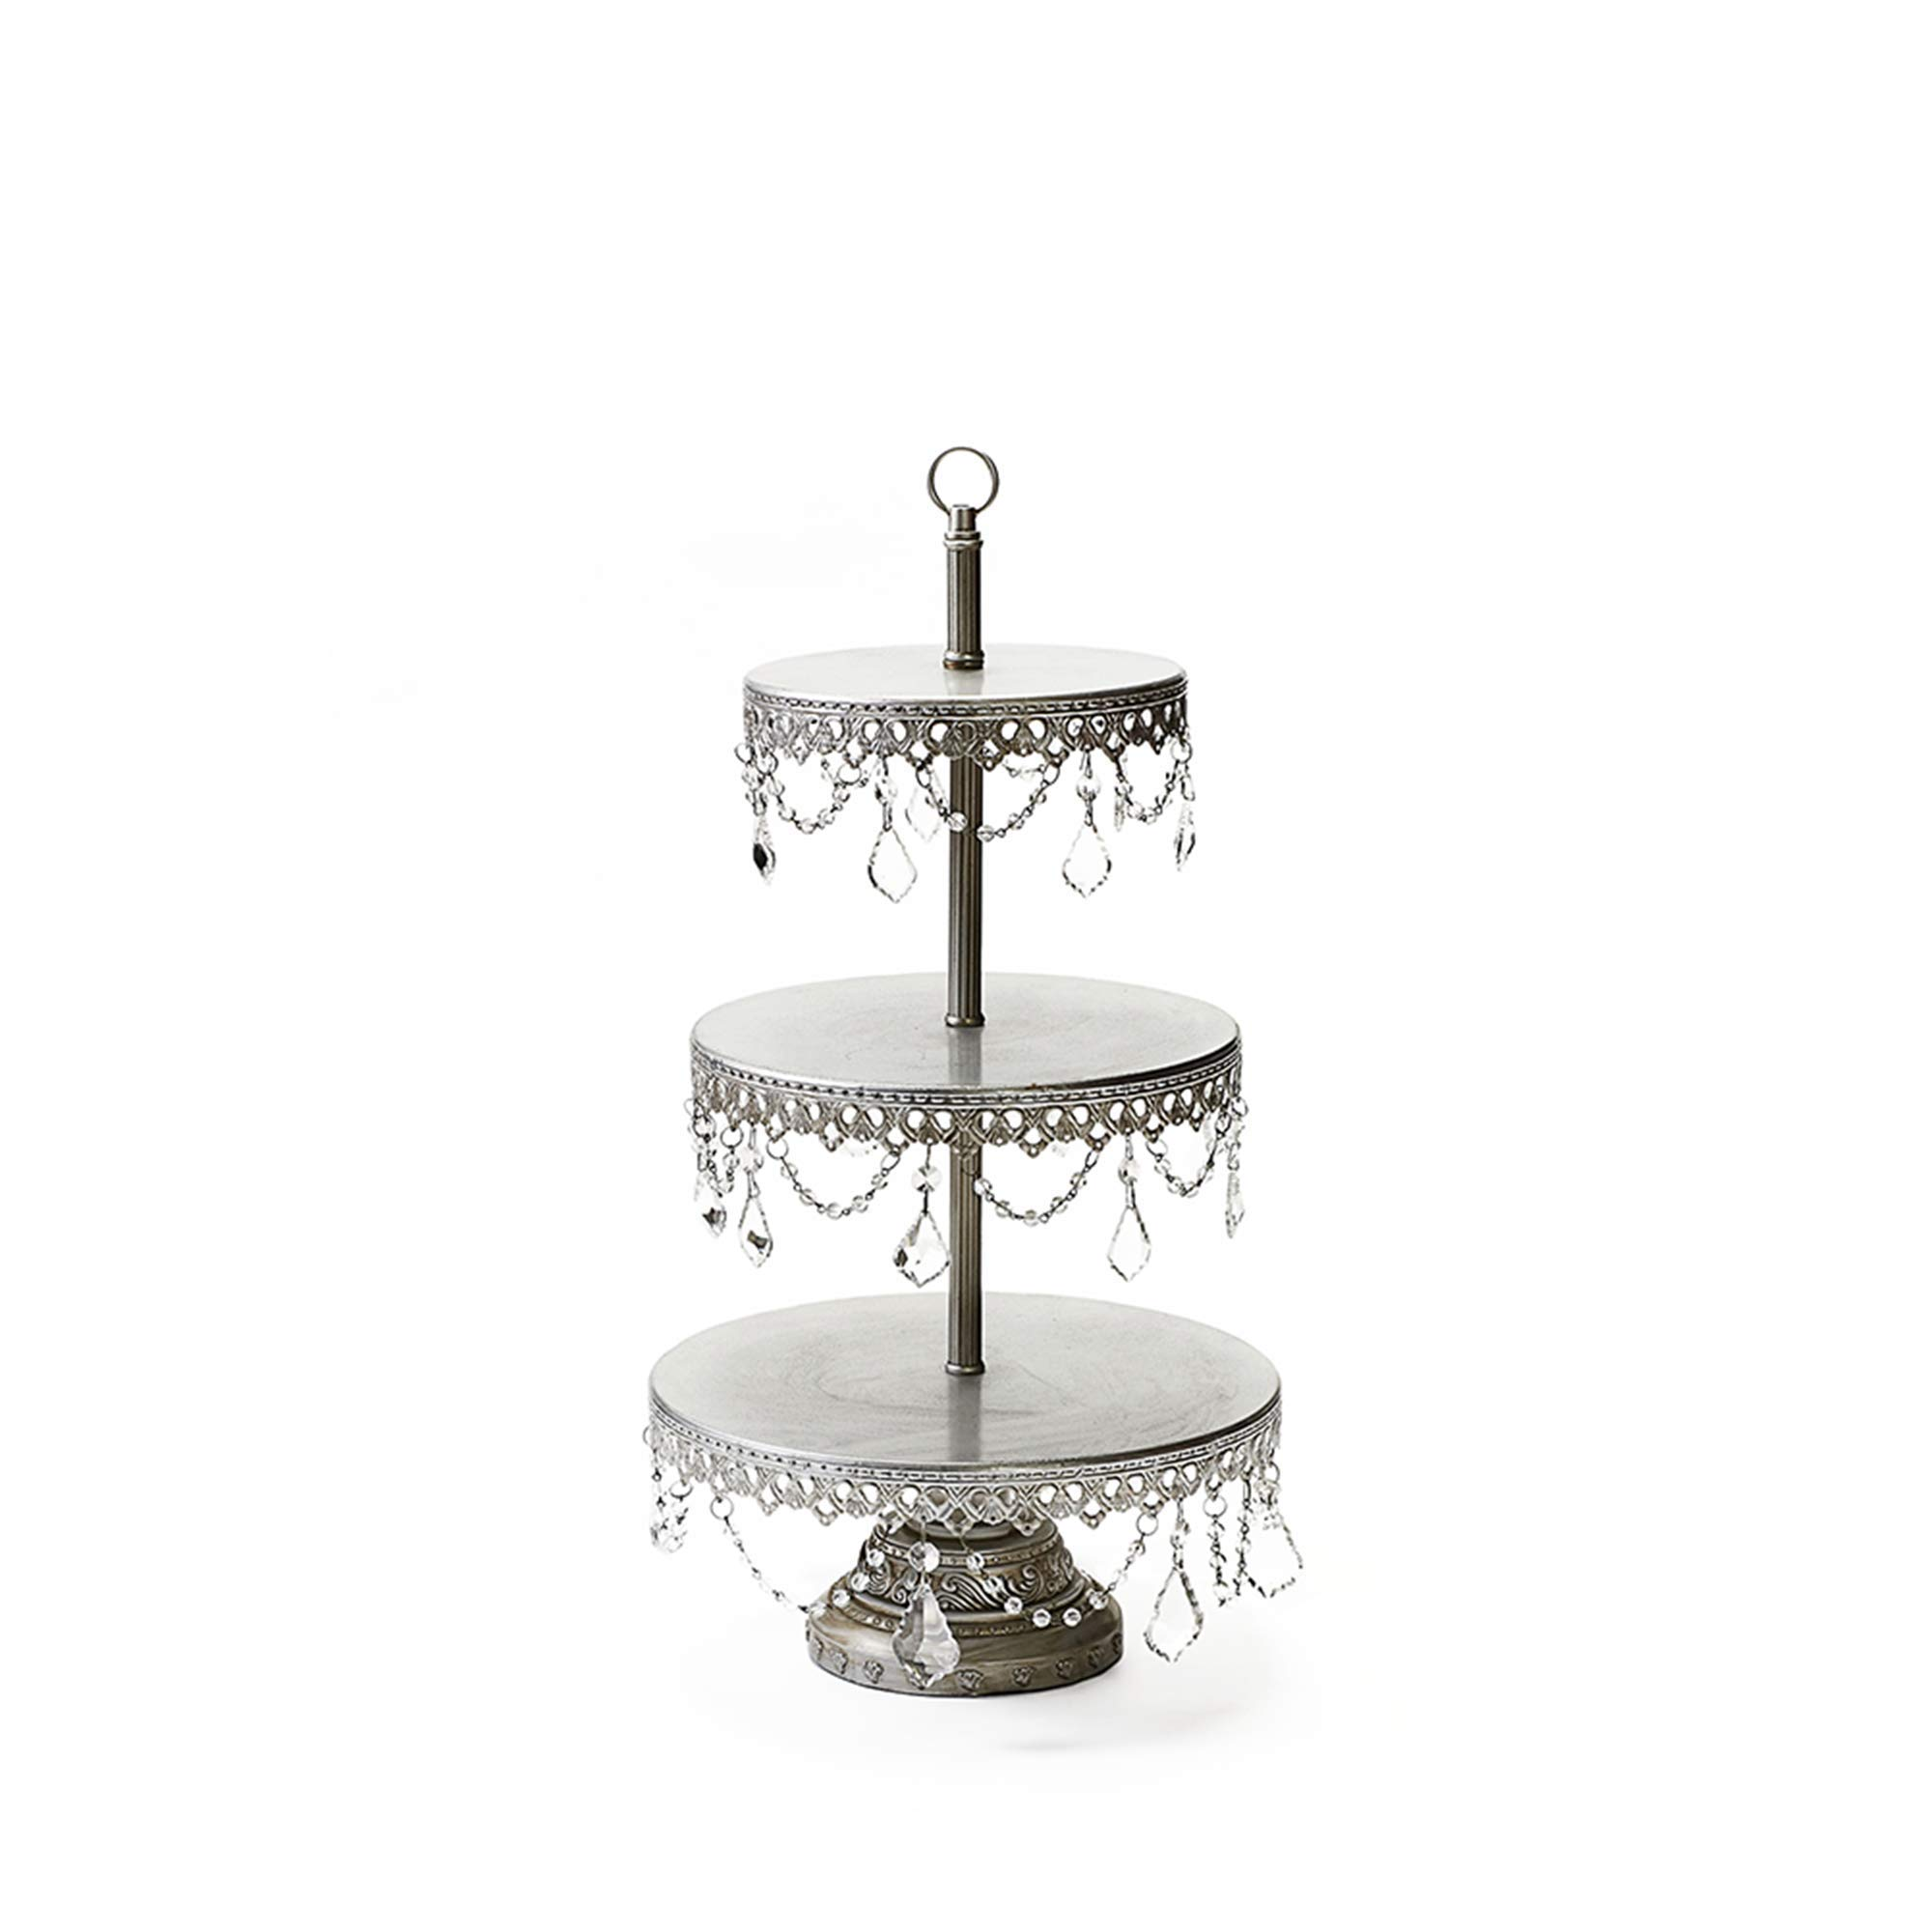 Opulent Treasures 3 Tiered Chandelier Dessert Tray Stand, Antique Silver, Wedding, Anniversary, Birthday Party Buffet Server